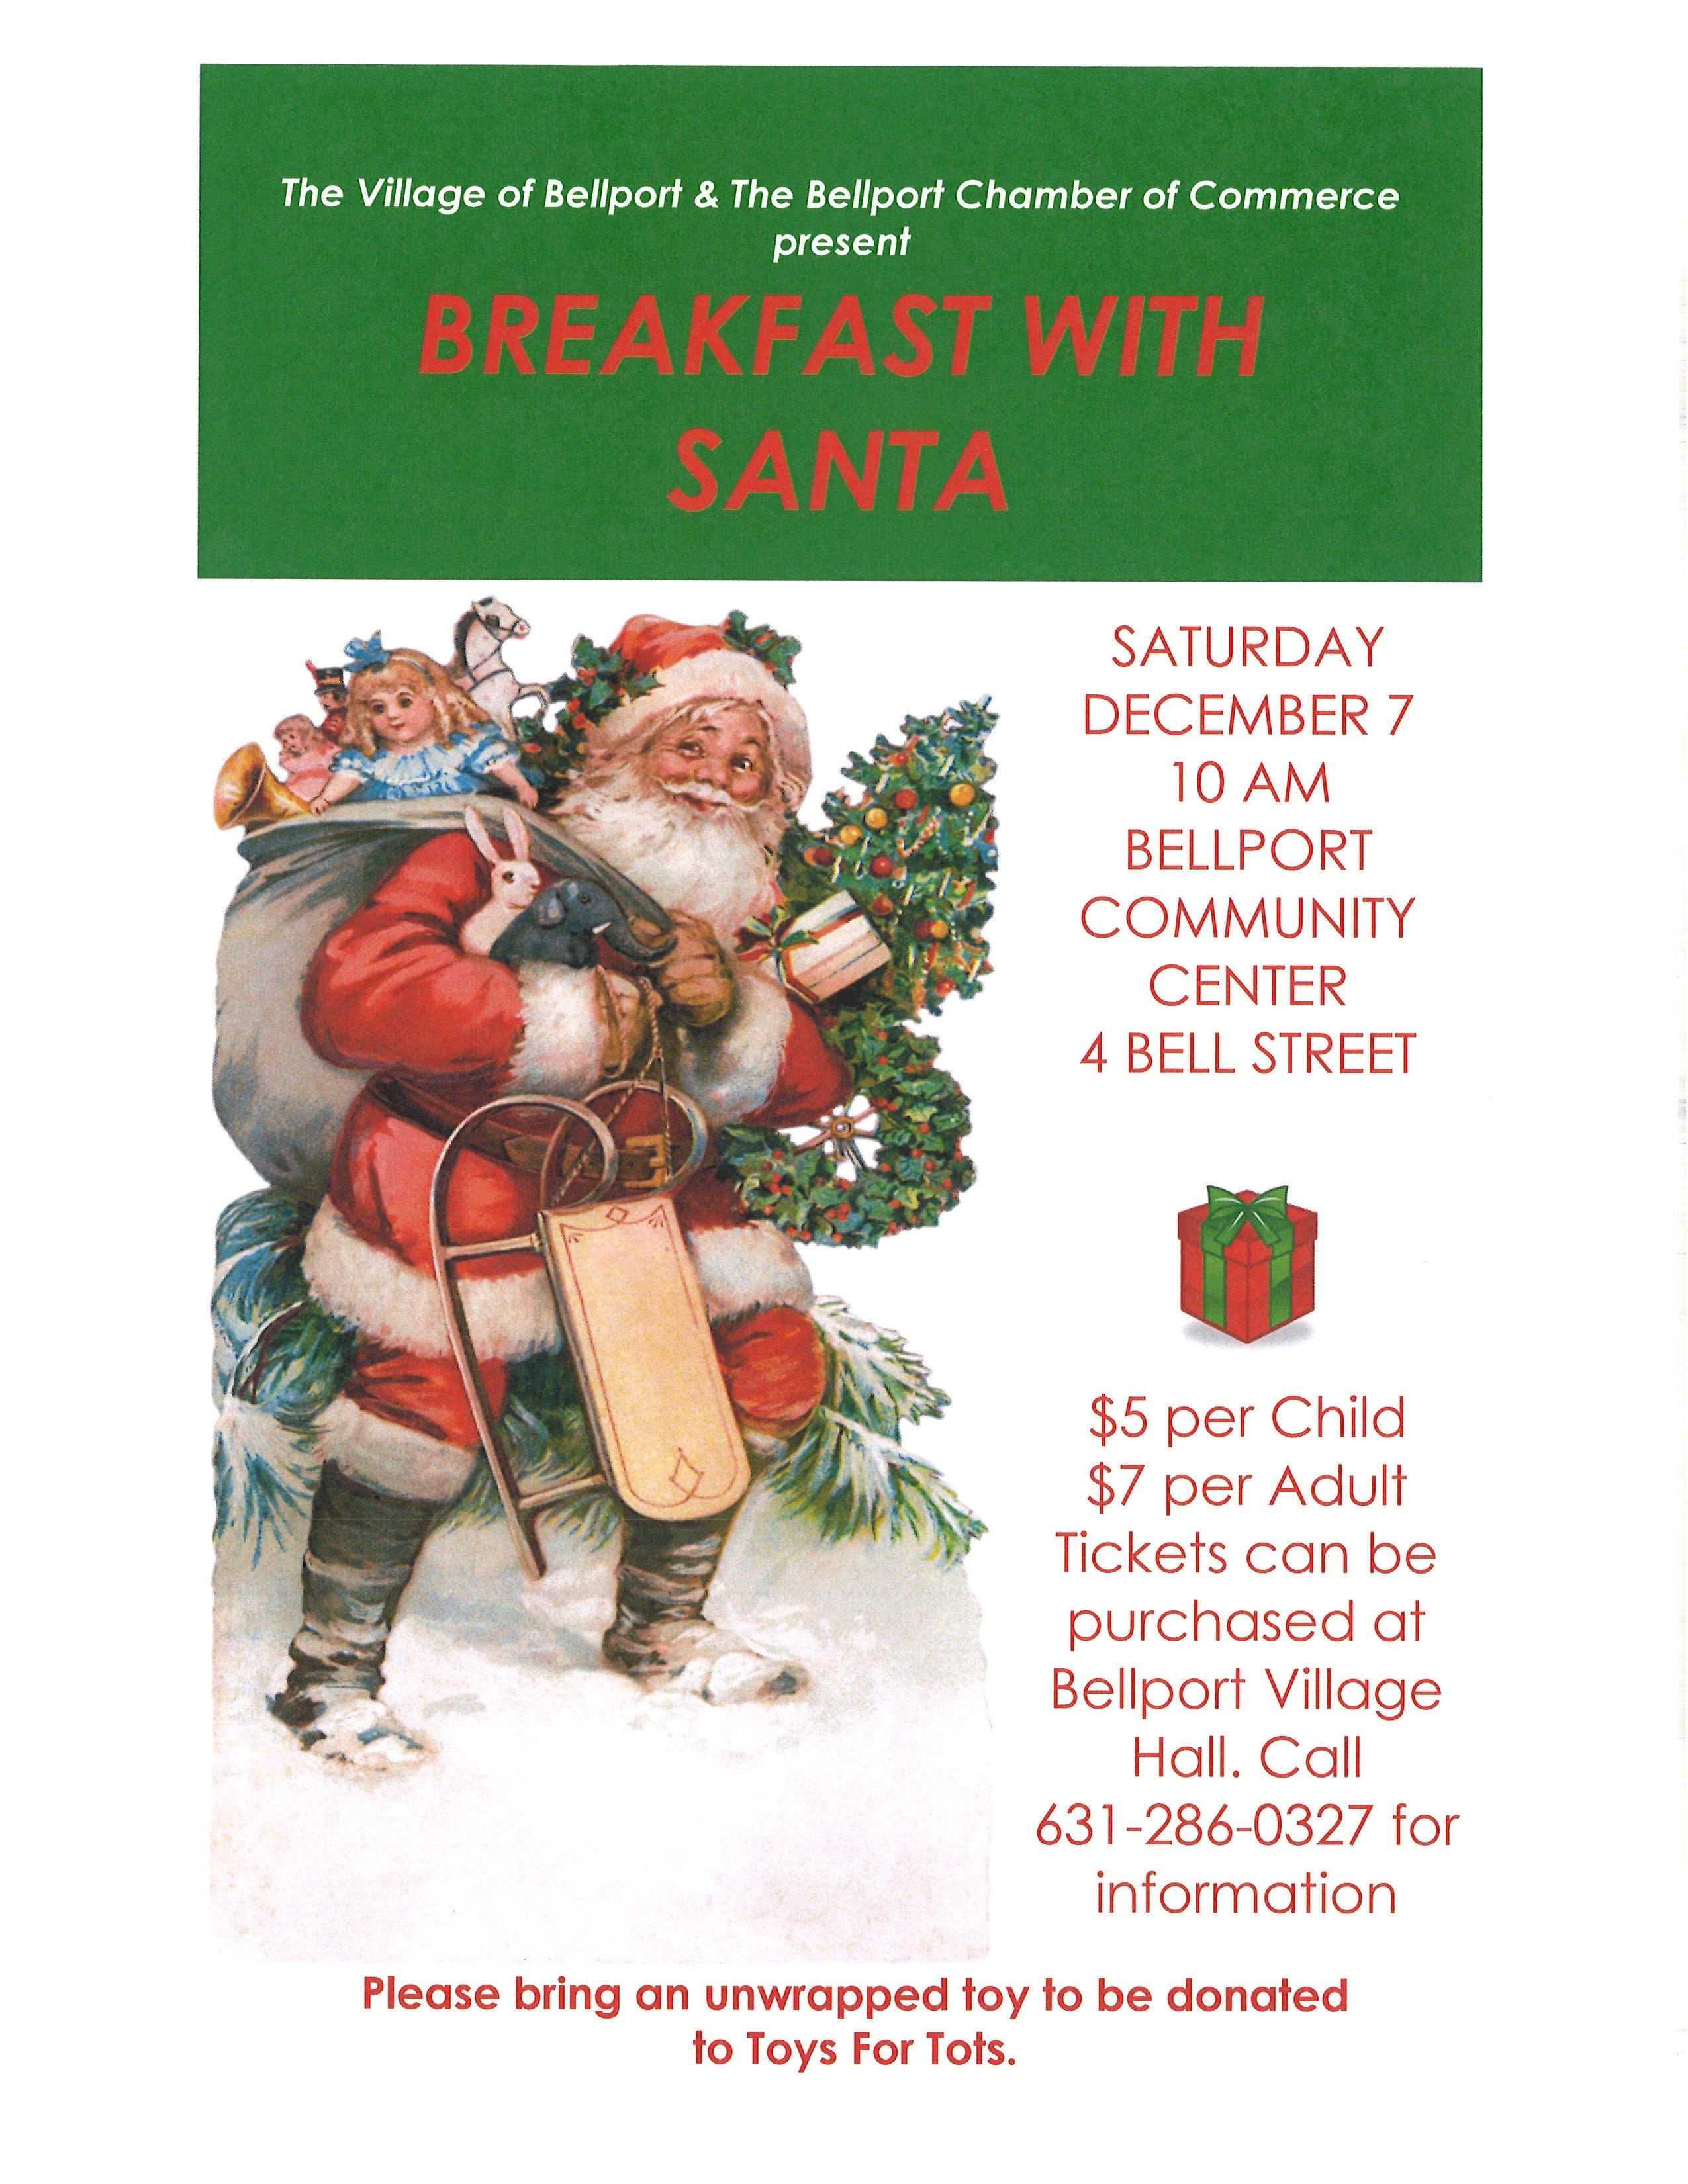 Breakfast with Santa - December 7, 2019 @ 10:00AM in the Bellport Community Center